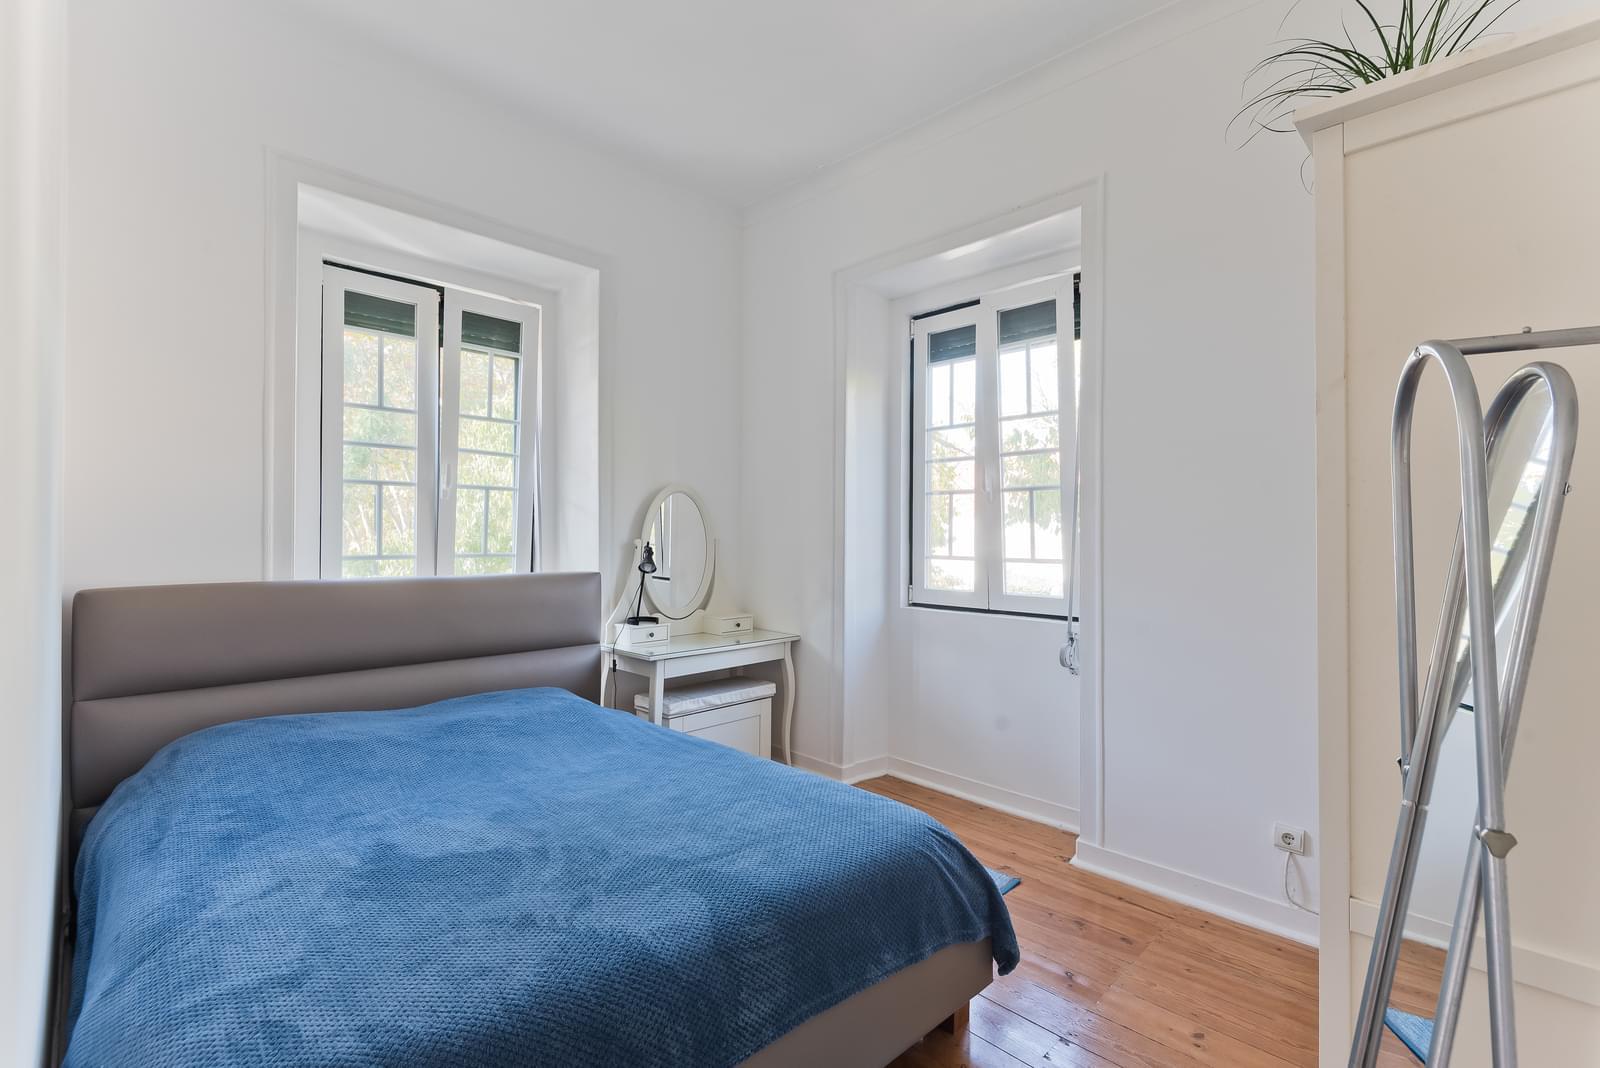 pf18798-apartamento-t3-1-cascais-a15eda85-ac3e-49dc-887b-53f0e40d9713